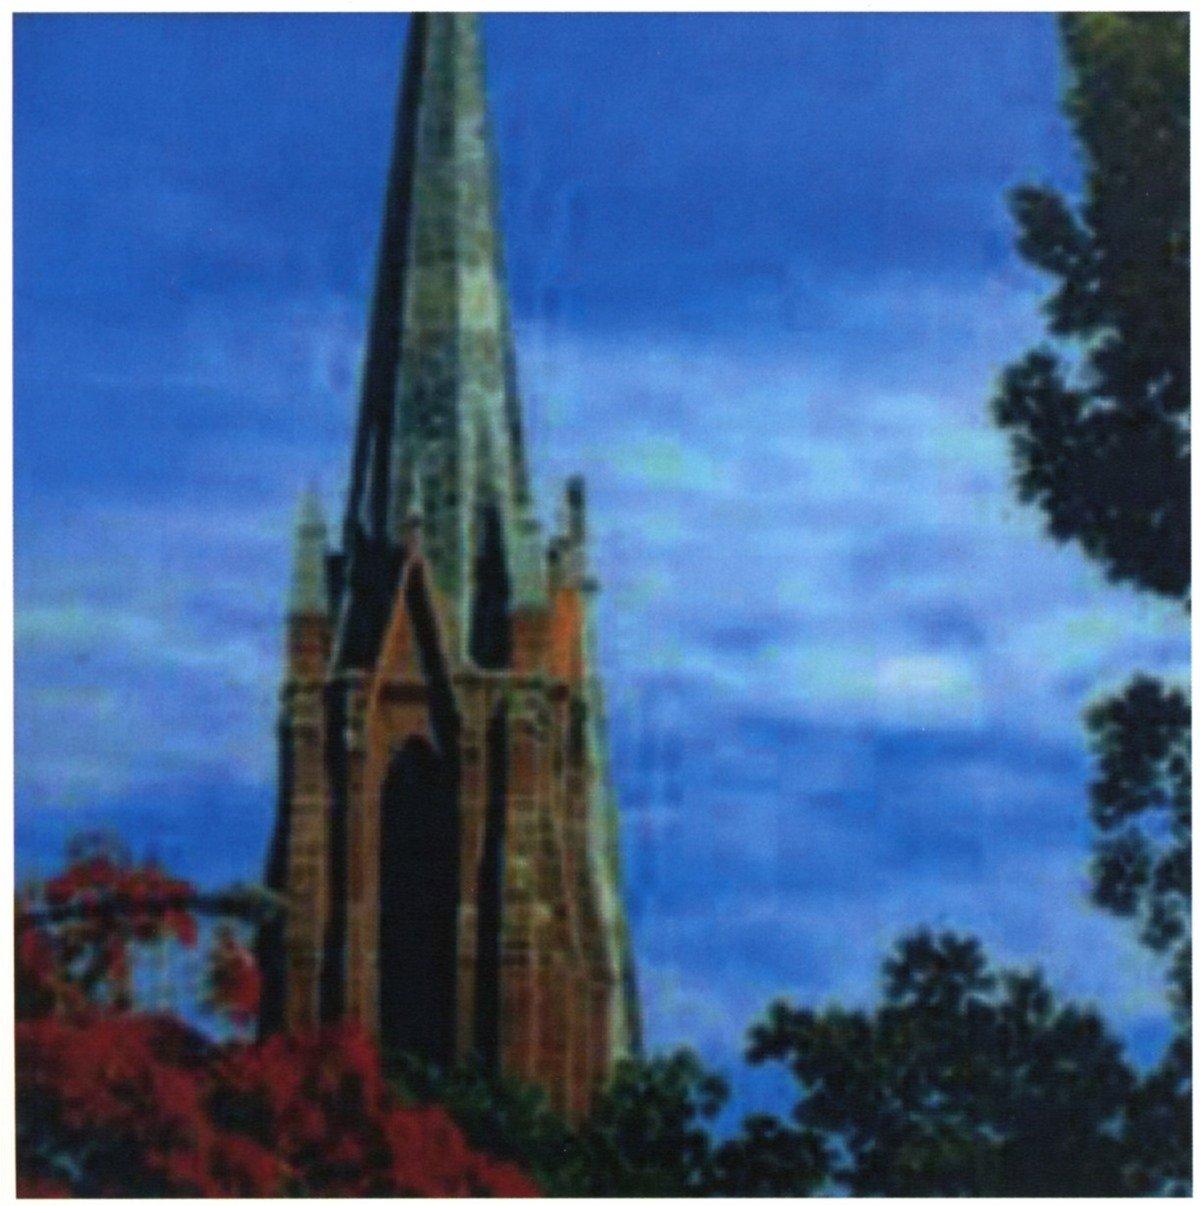 CD : John Maus - Addendum (CD)